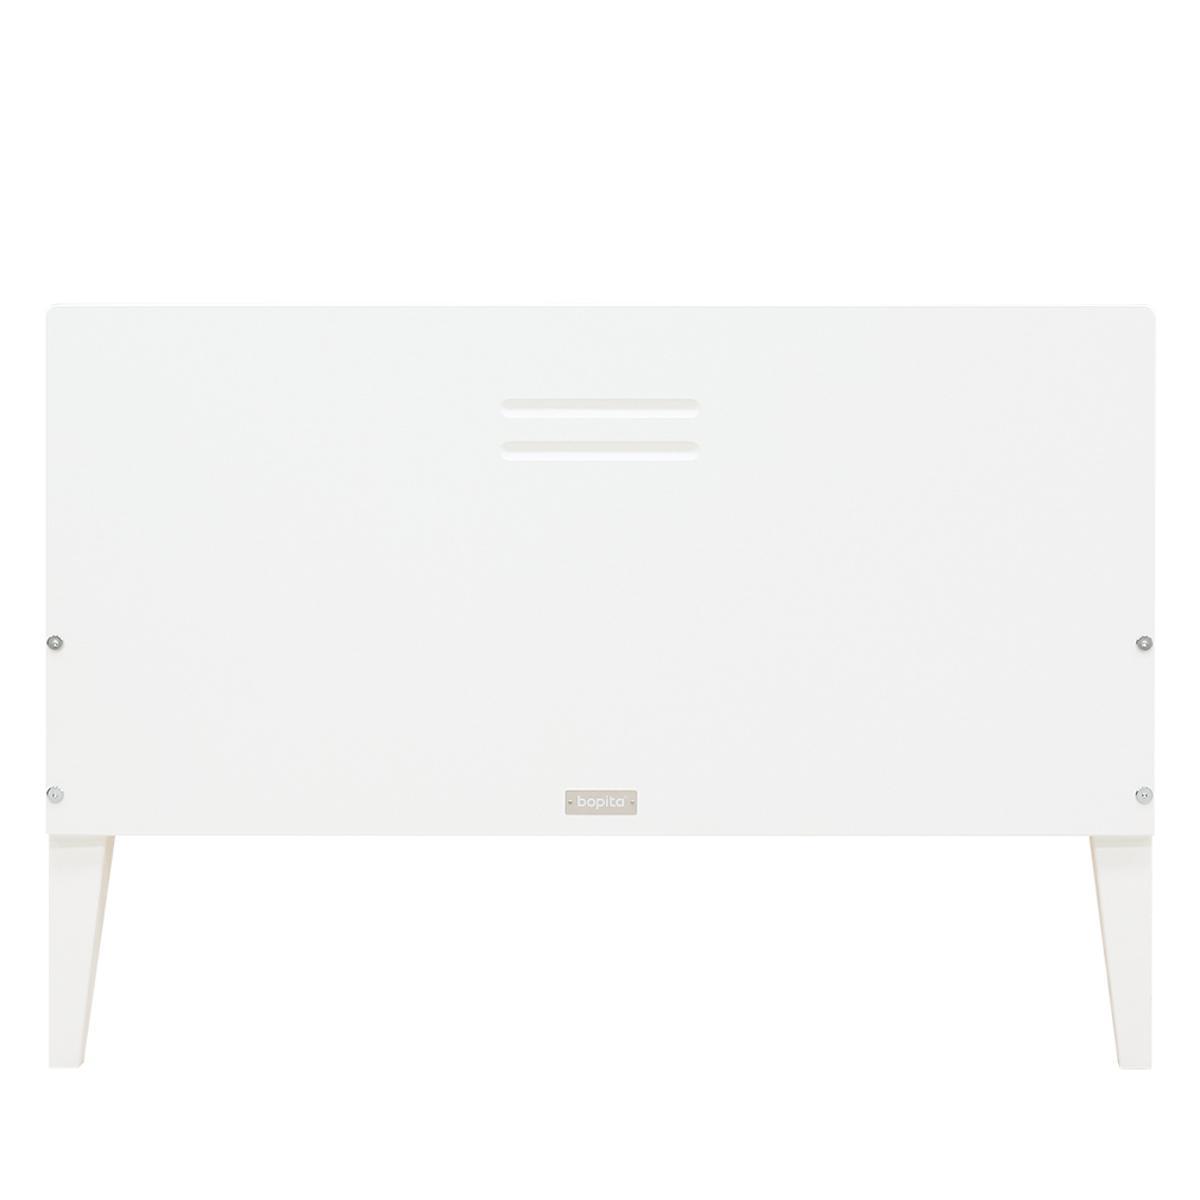 Lit 90x200cm LOCKER Bopita blanc